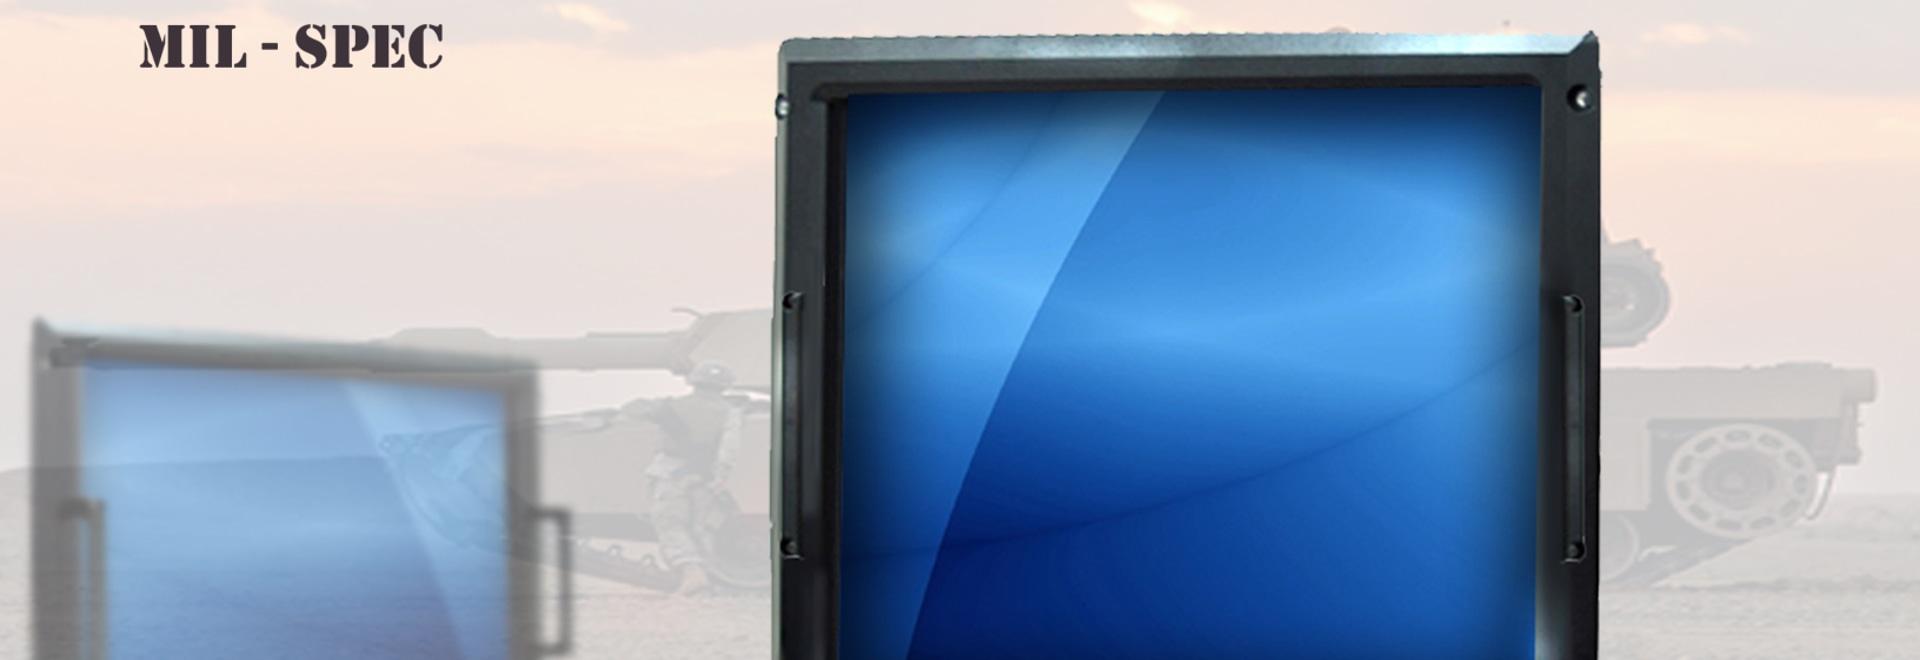 Acnodes Rackmount Monitor des 9U-Hoch-20,1 Zoll-MIL-SPEC